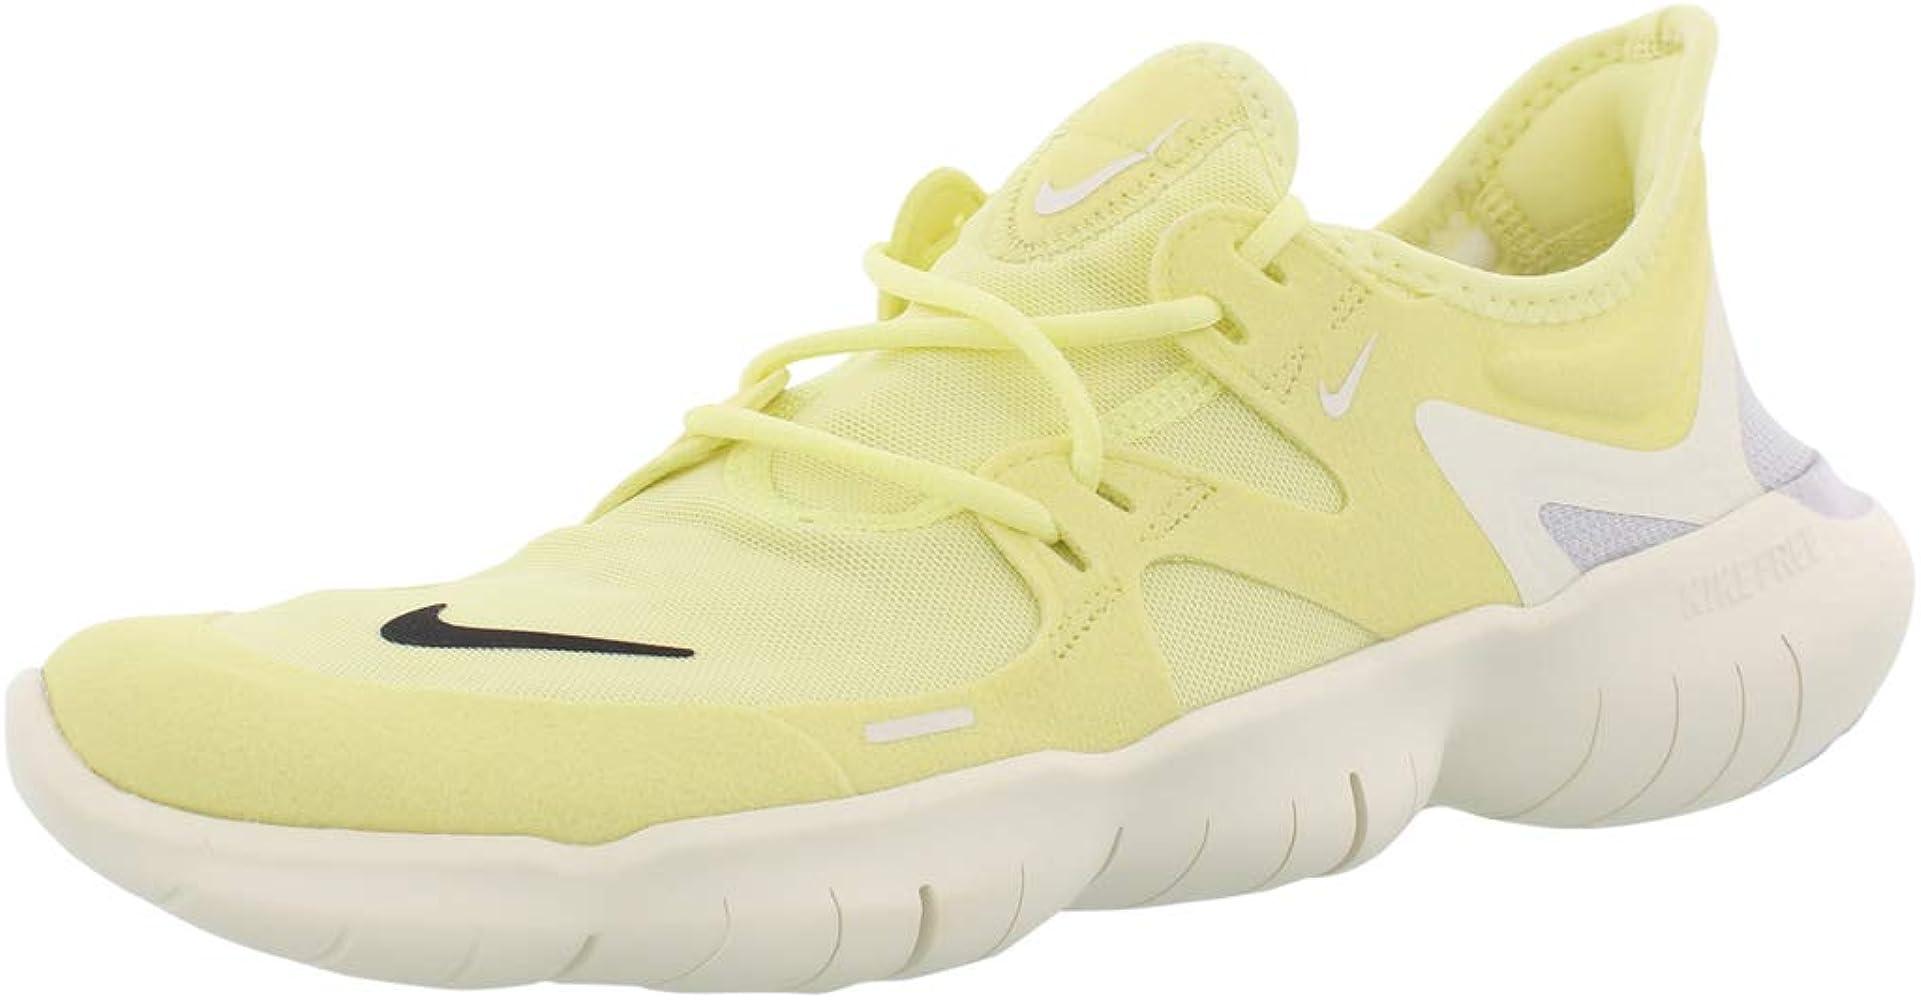 Nike Free Run 5.0 Mens Shoes Size